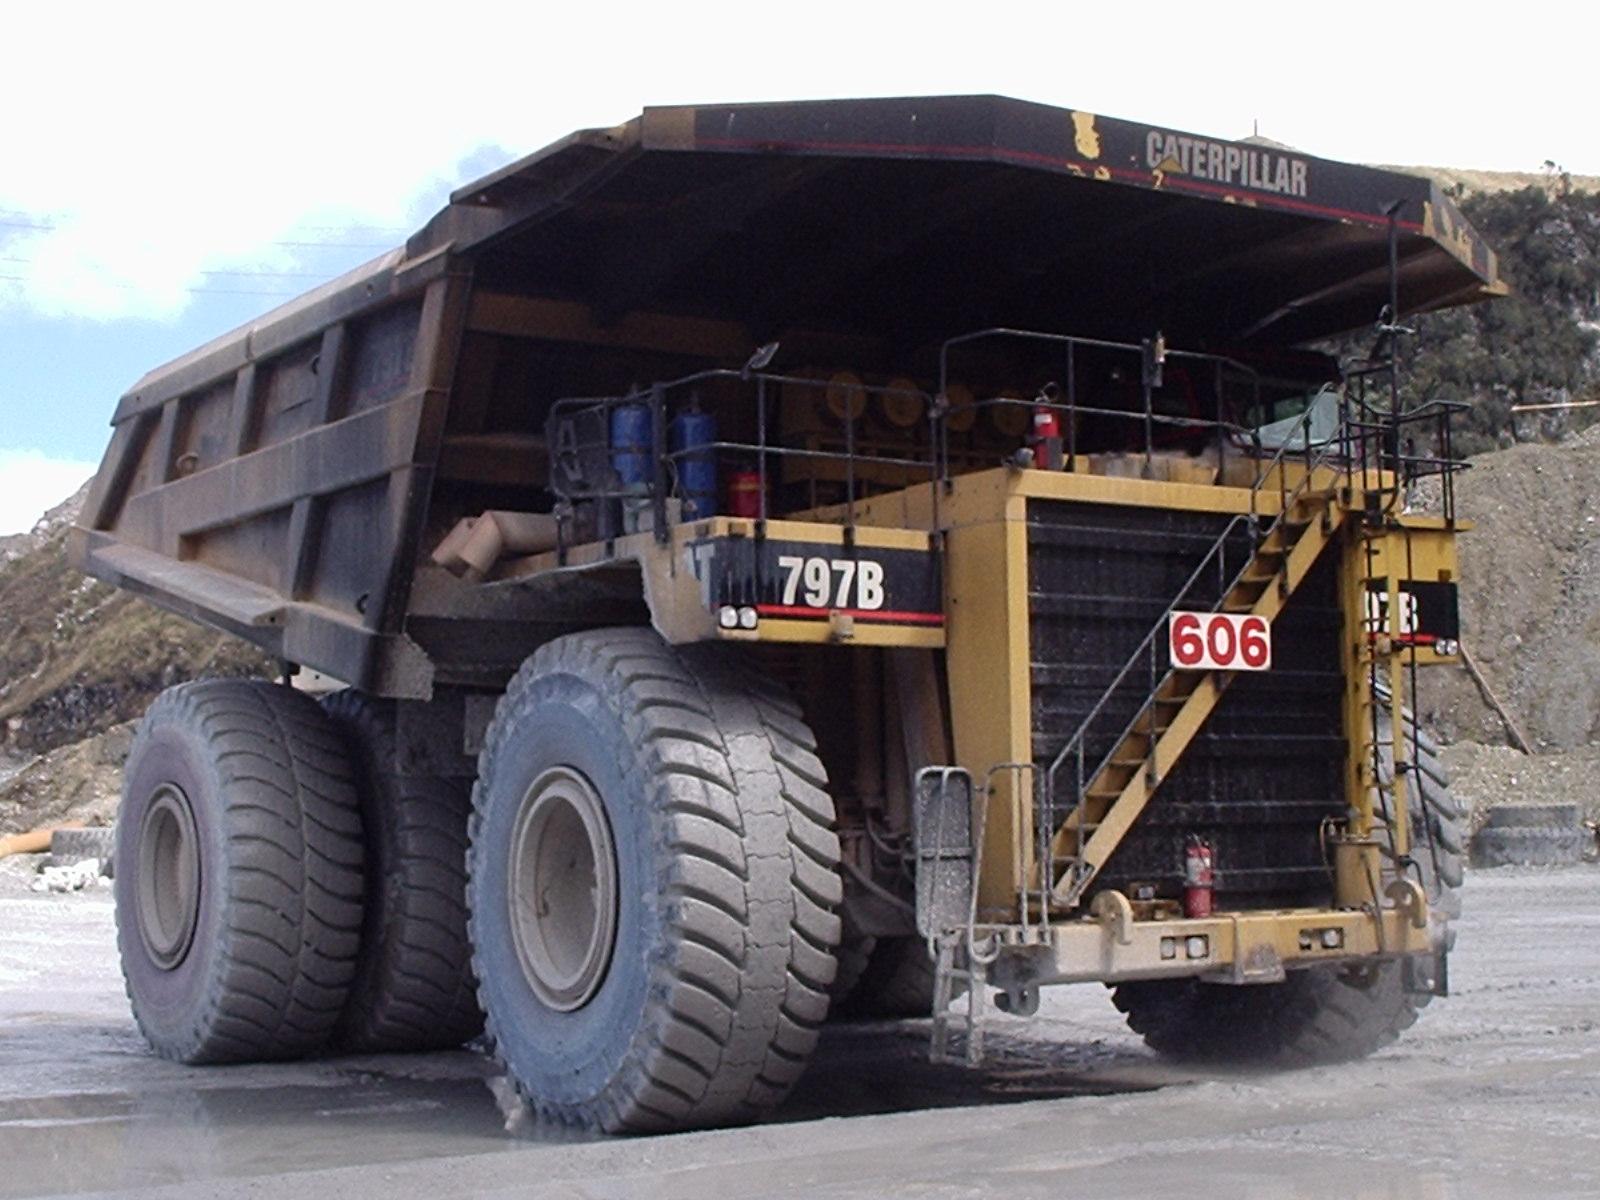 Caterpillar 797b Tractor Amp Construction Plant Wiki